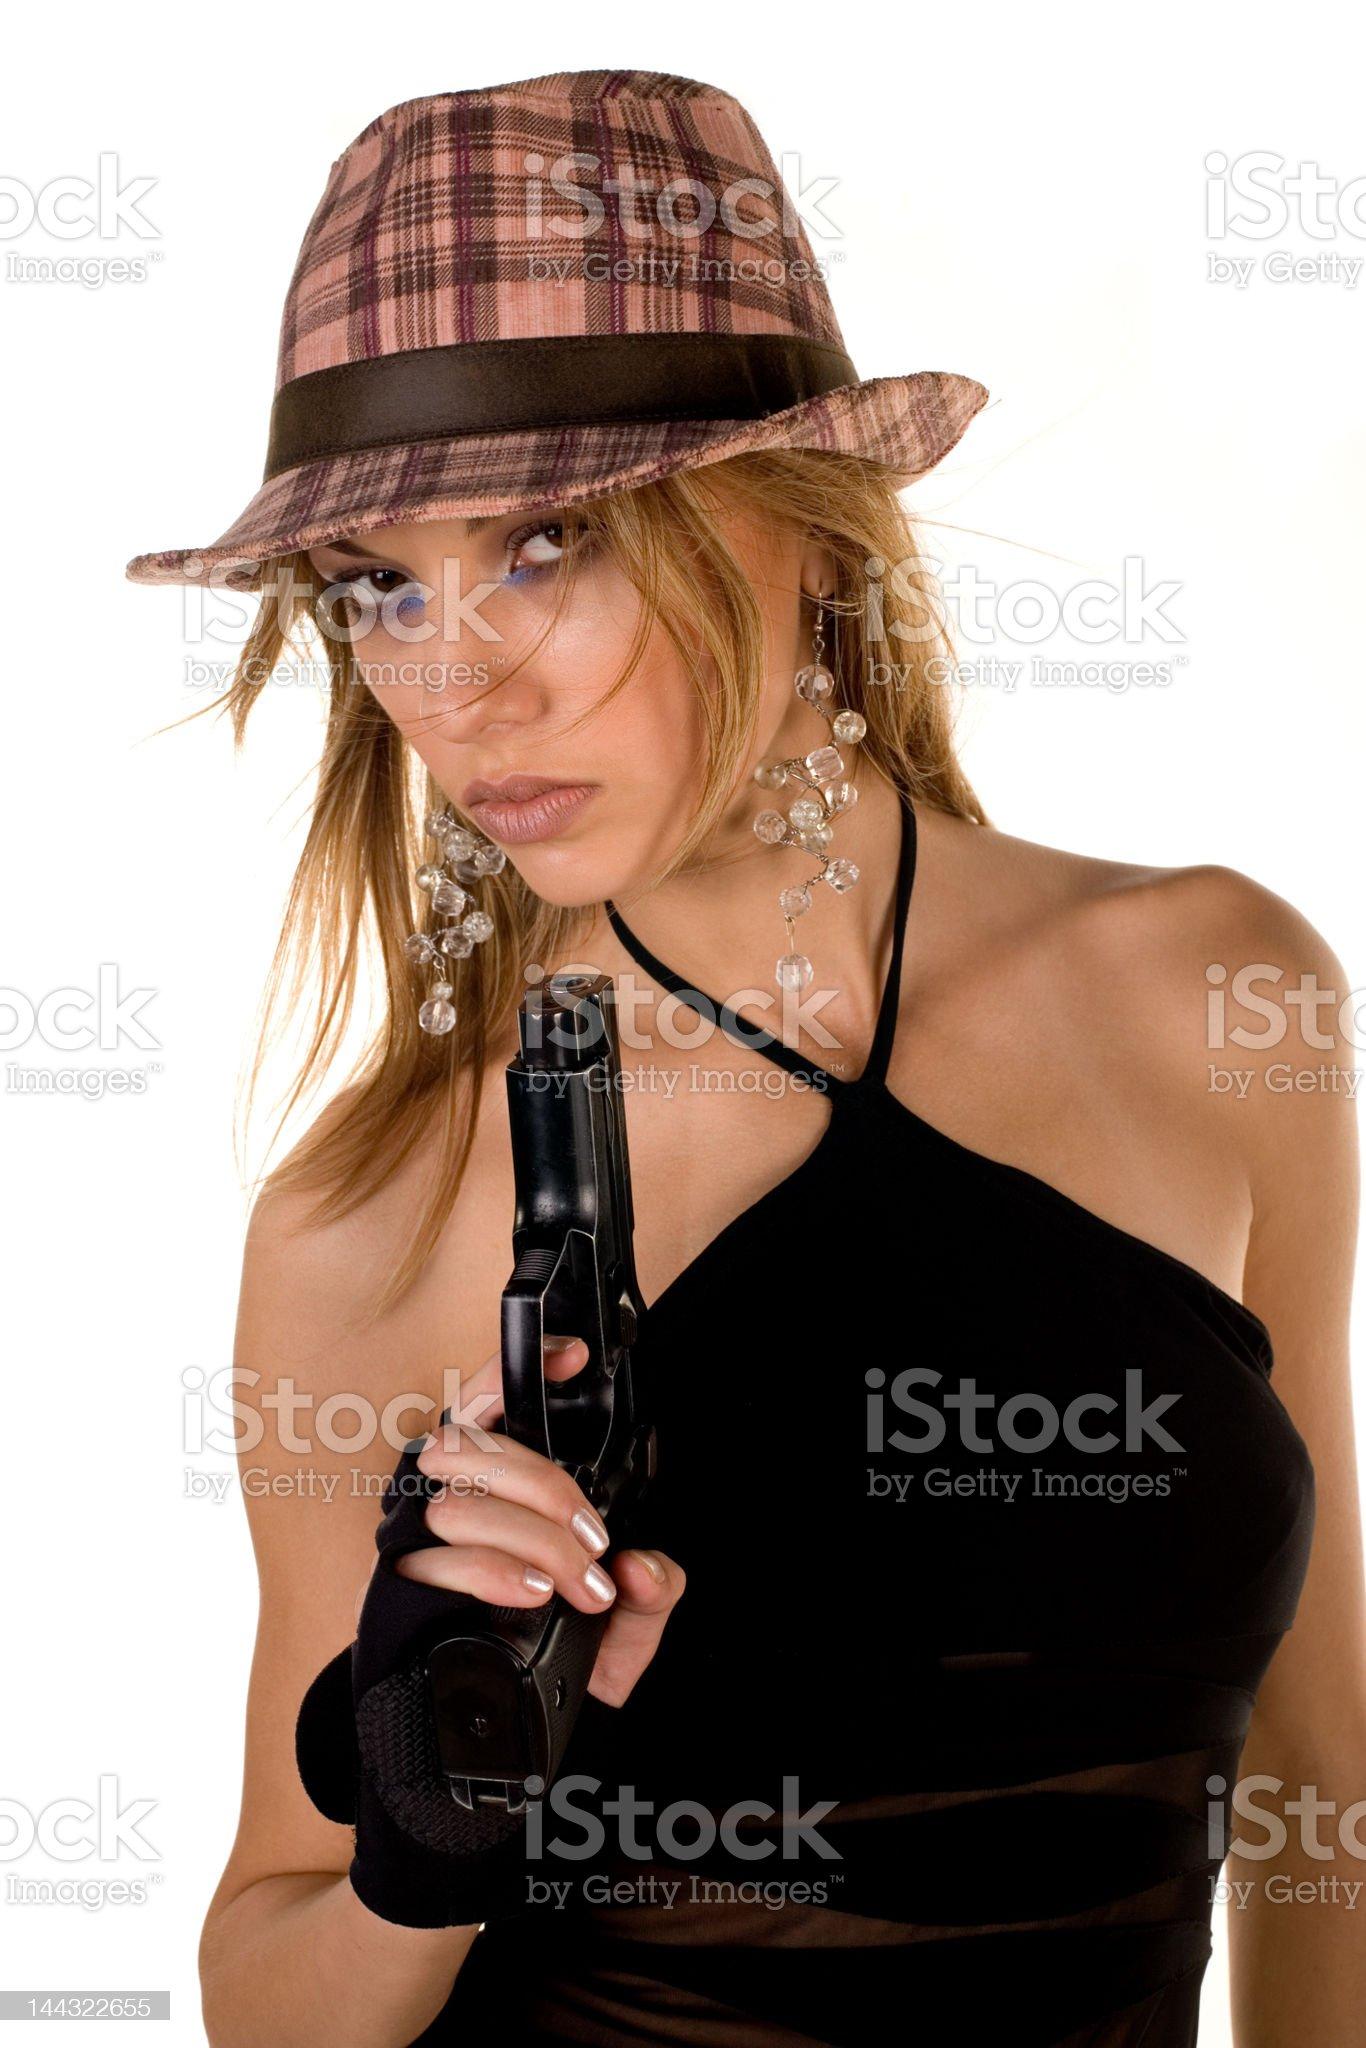 blonde beauty and handgun royalty-free stock photo